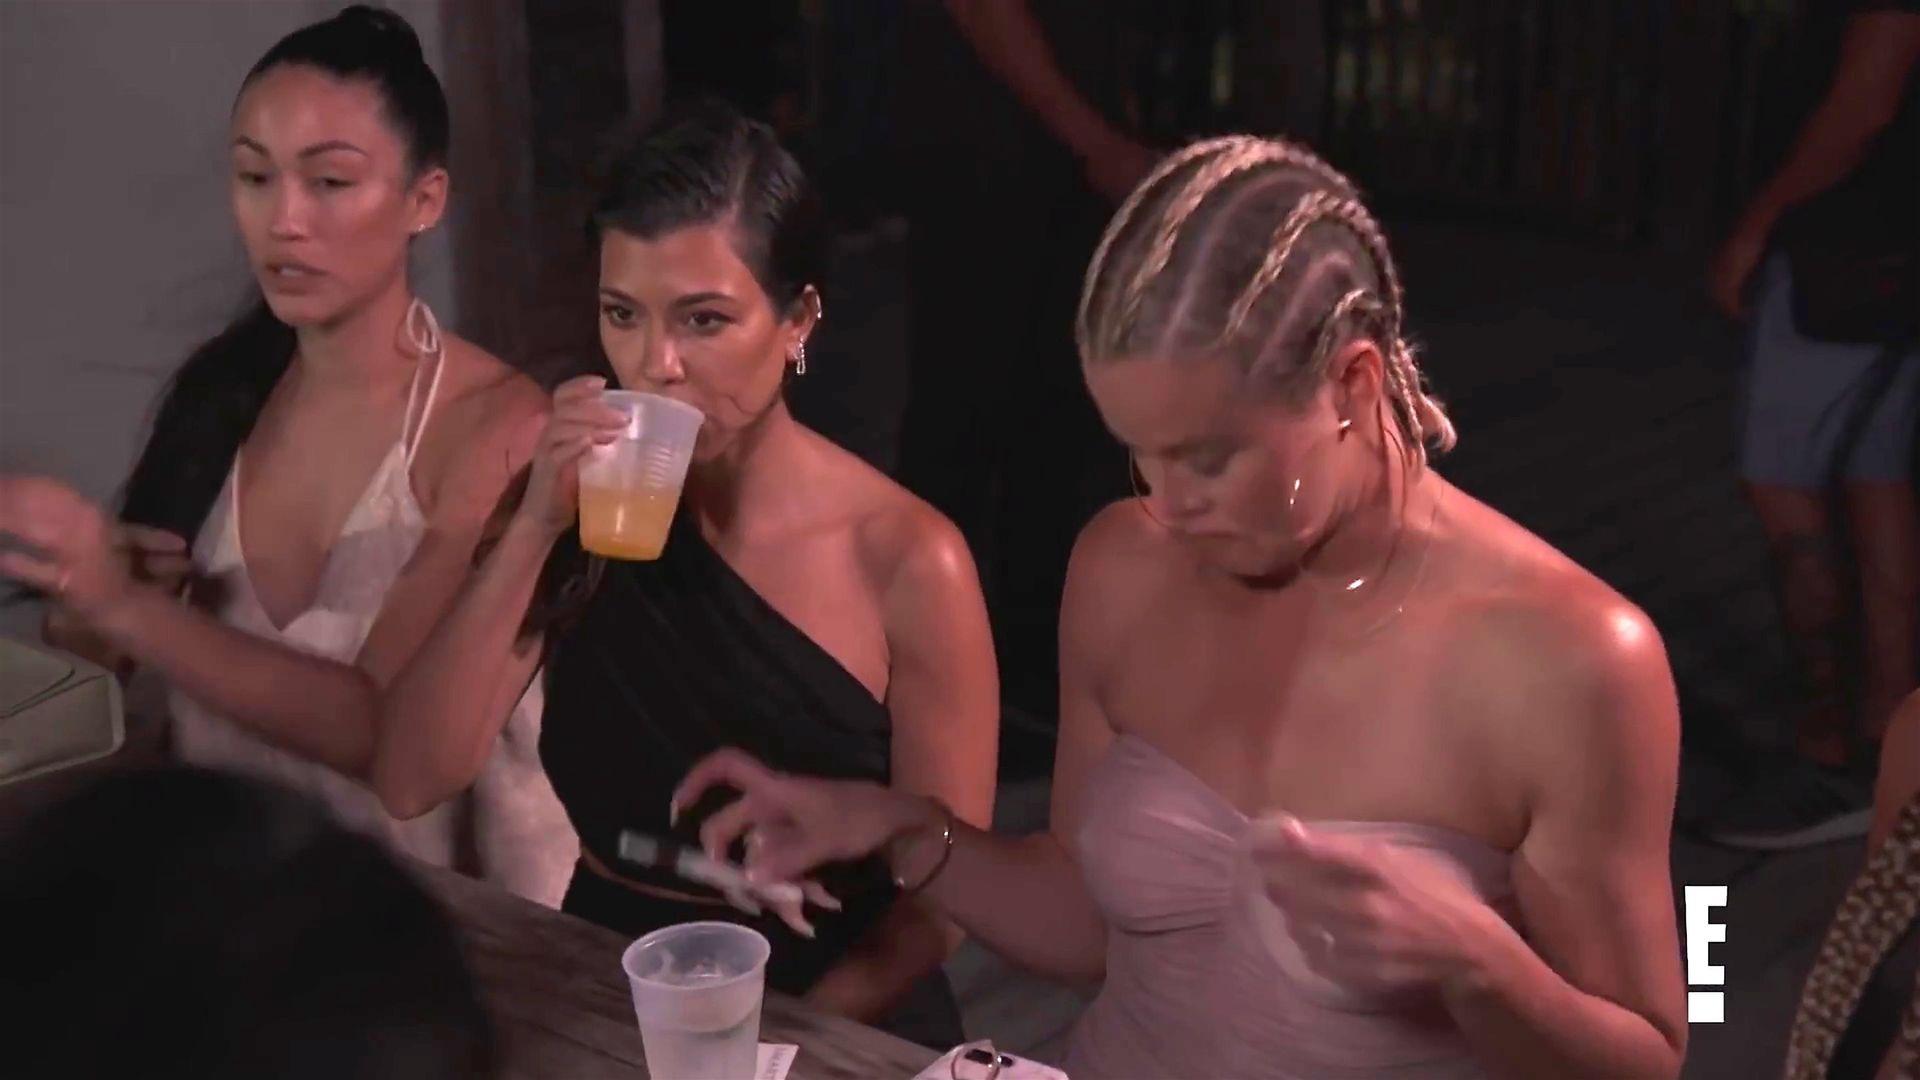 Khloé Kardashian Gets A Little Cold Without A Bra 0021